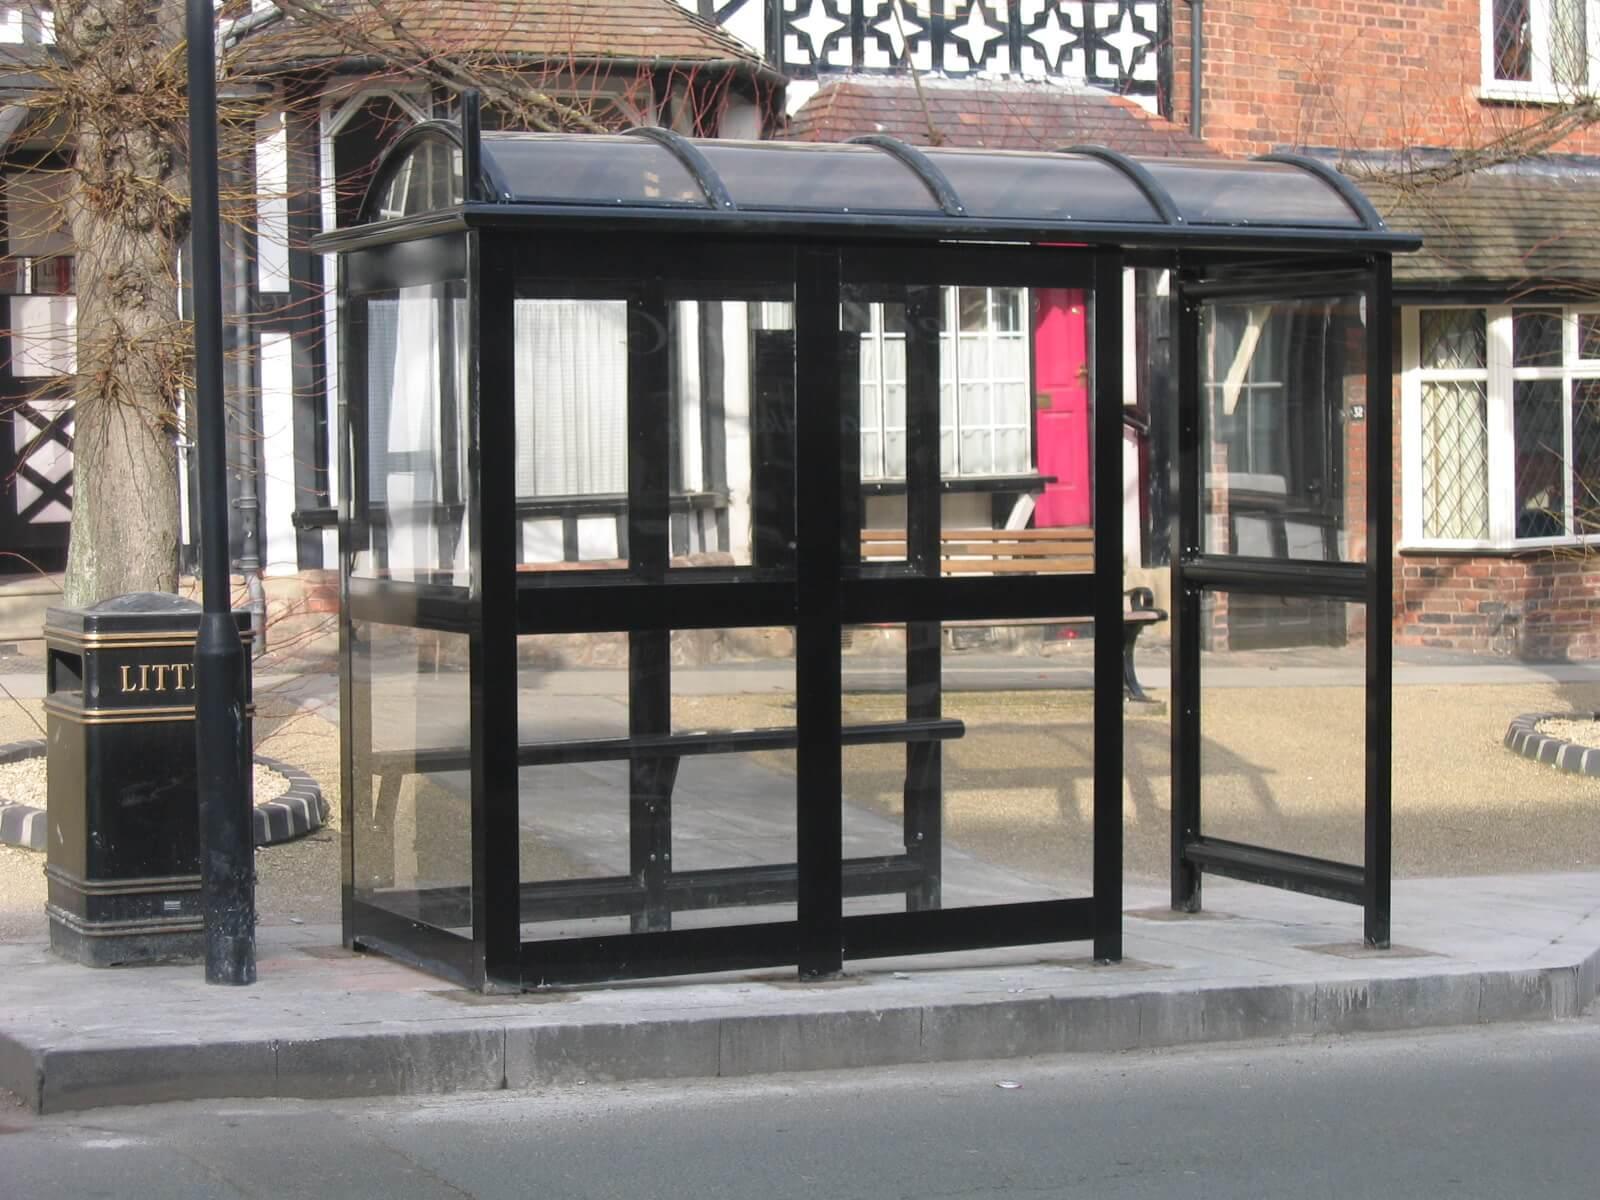 3 Bay Aluminium Eco Bus Shelter Enclosed wth Perch seating